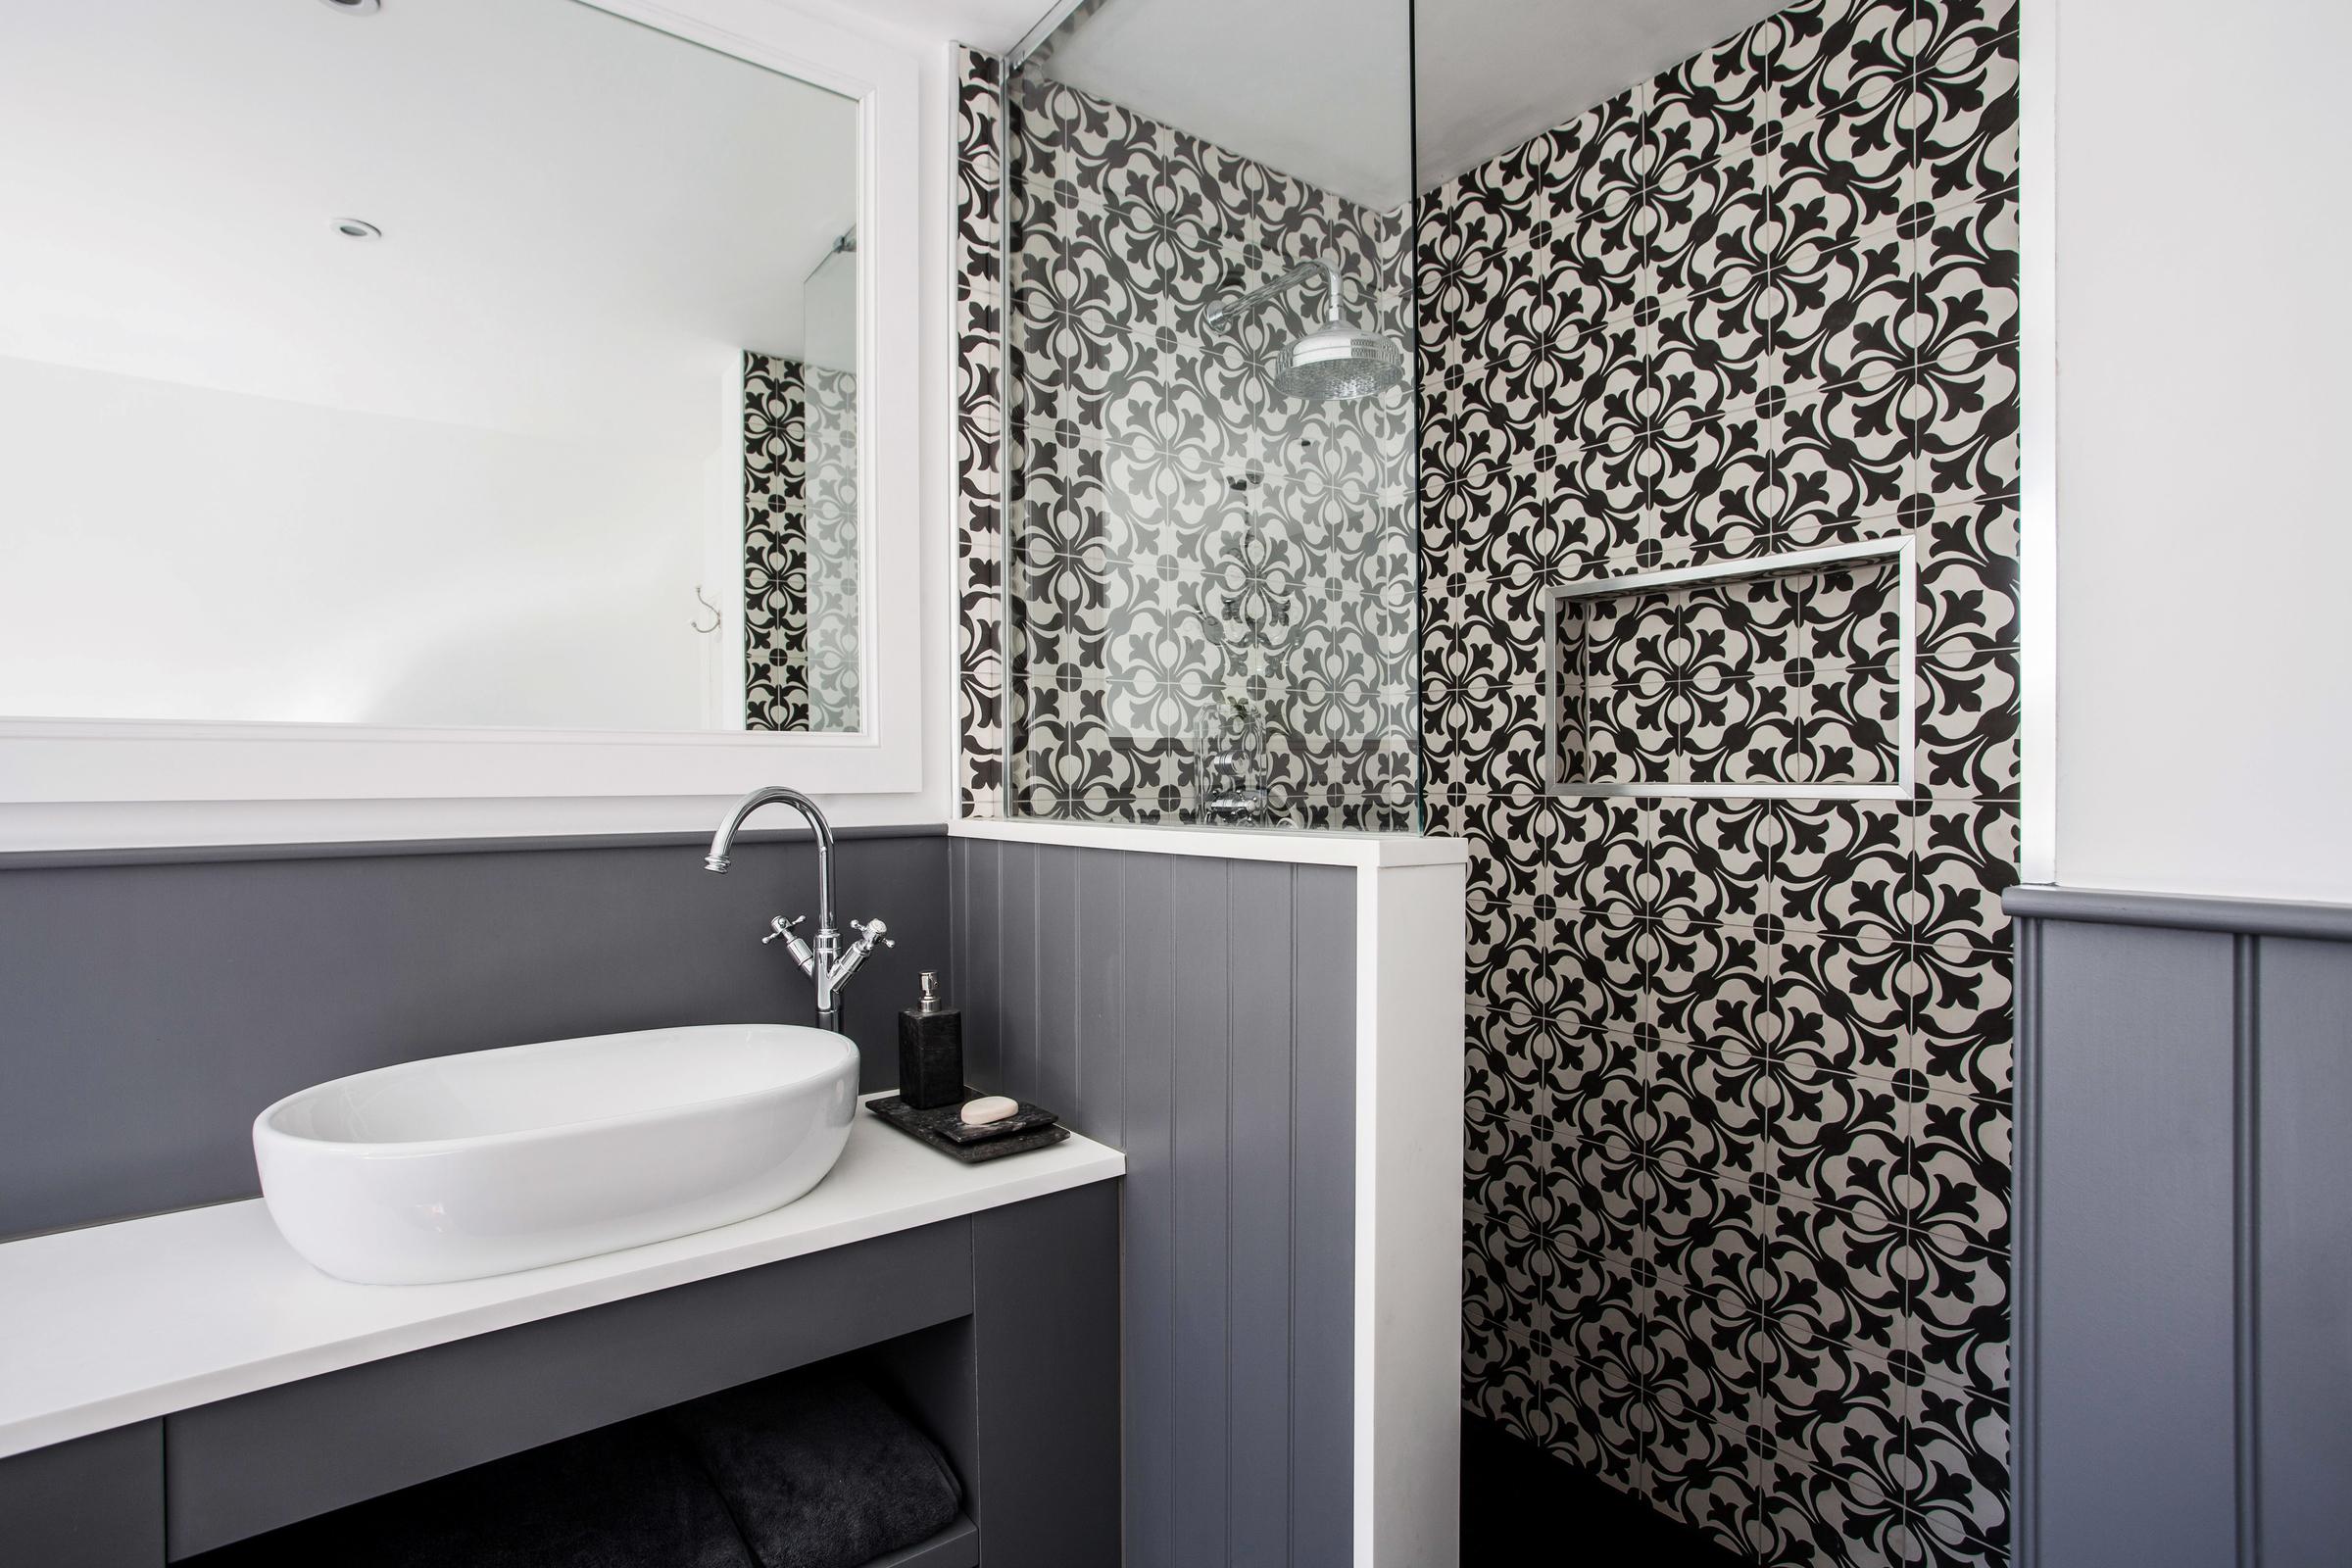 Boutique Hotel Bathroom Burlanes Interiors Kent And Essex